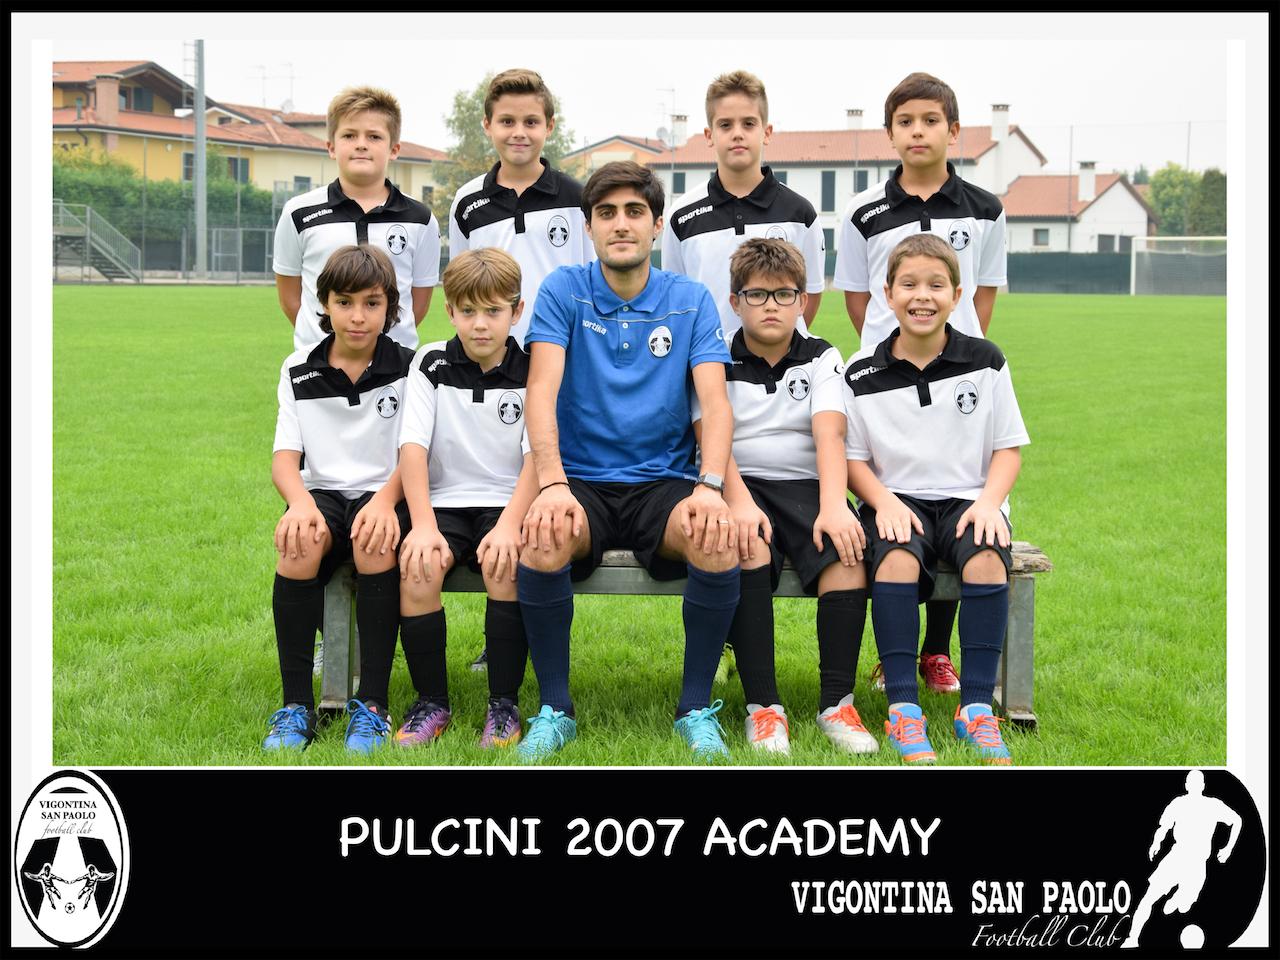 2007-Pulcini-Academy